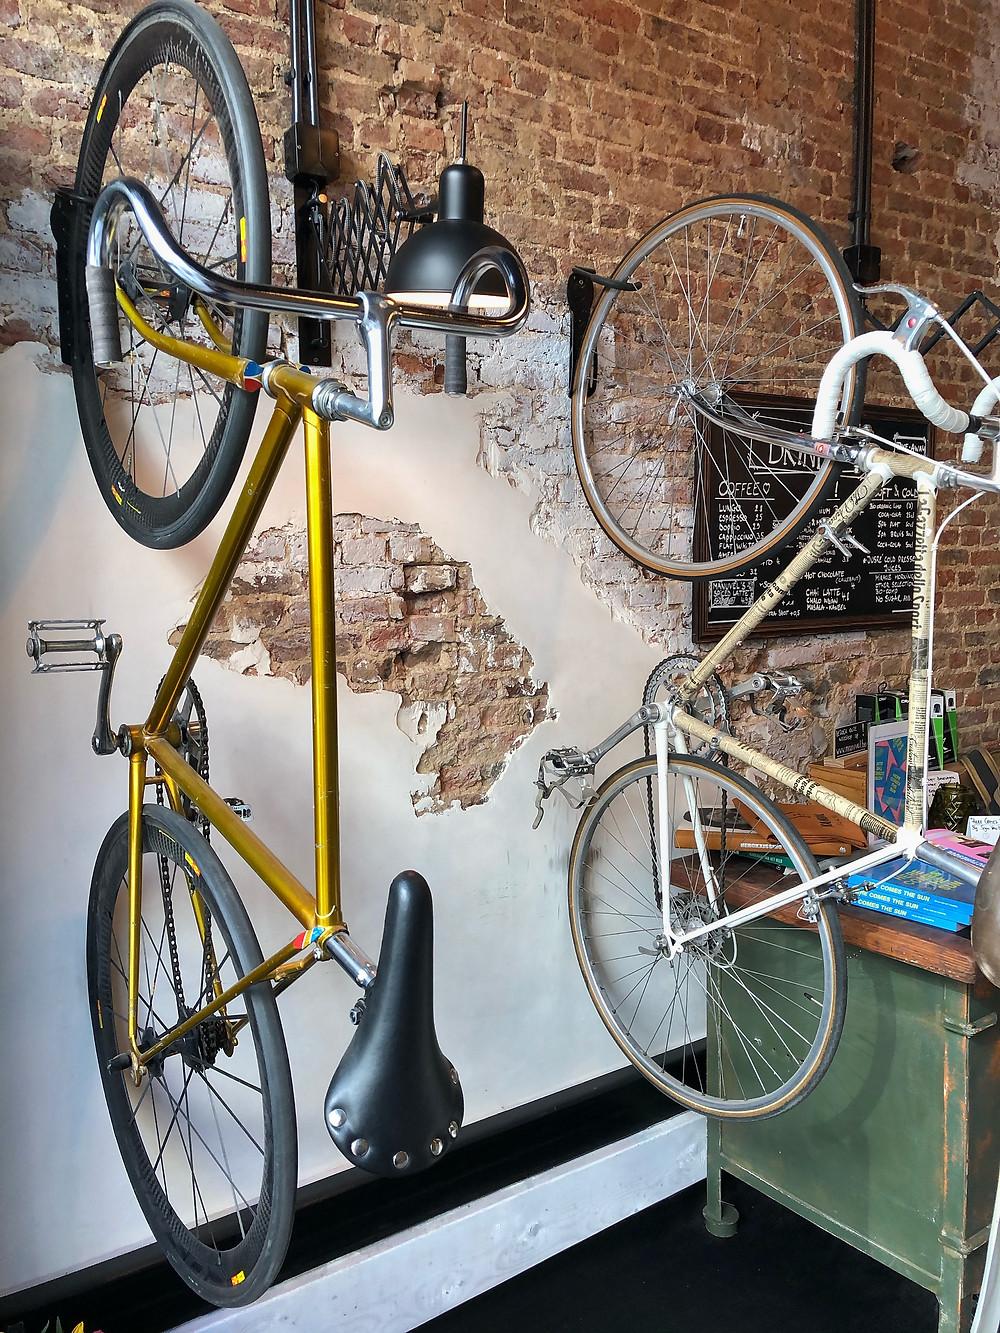 Bikes at Manuvèl Sint-Niklaas